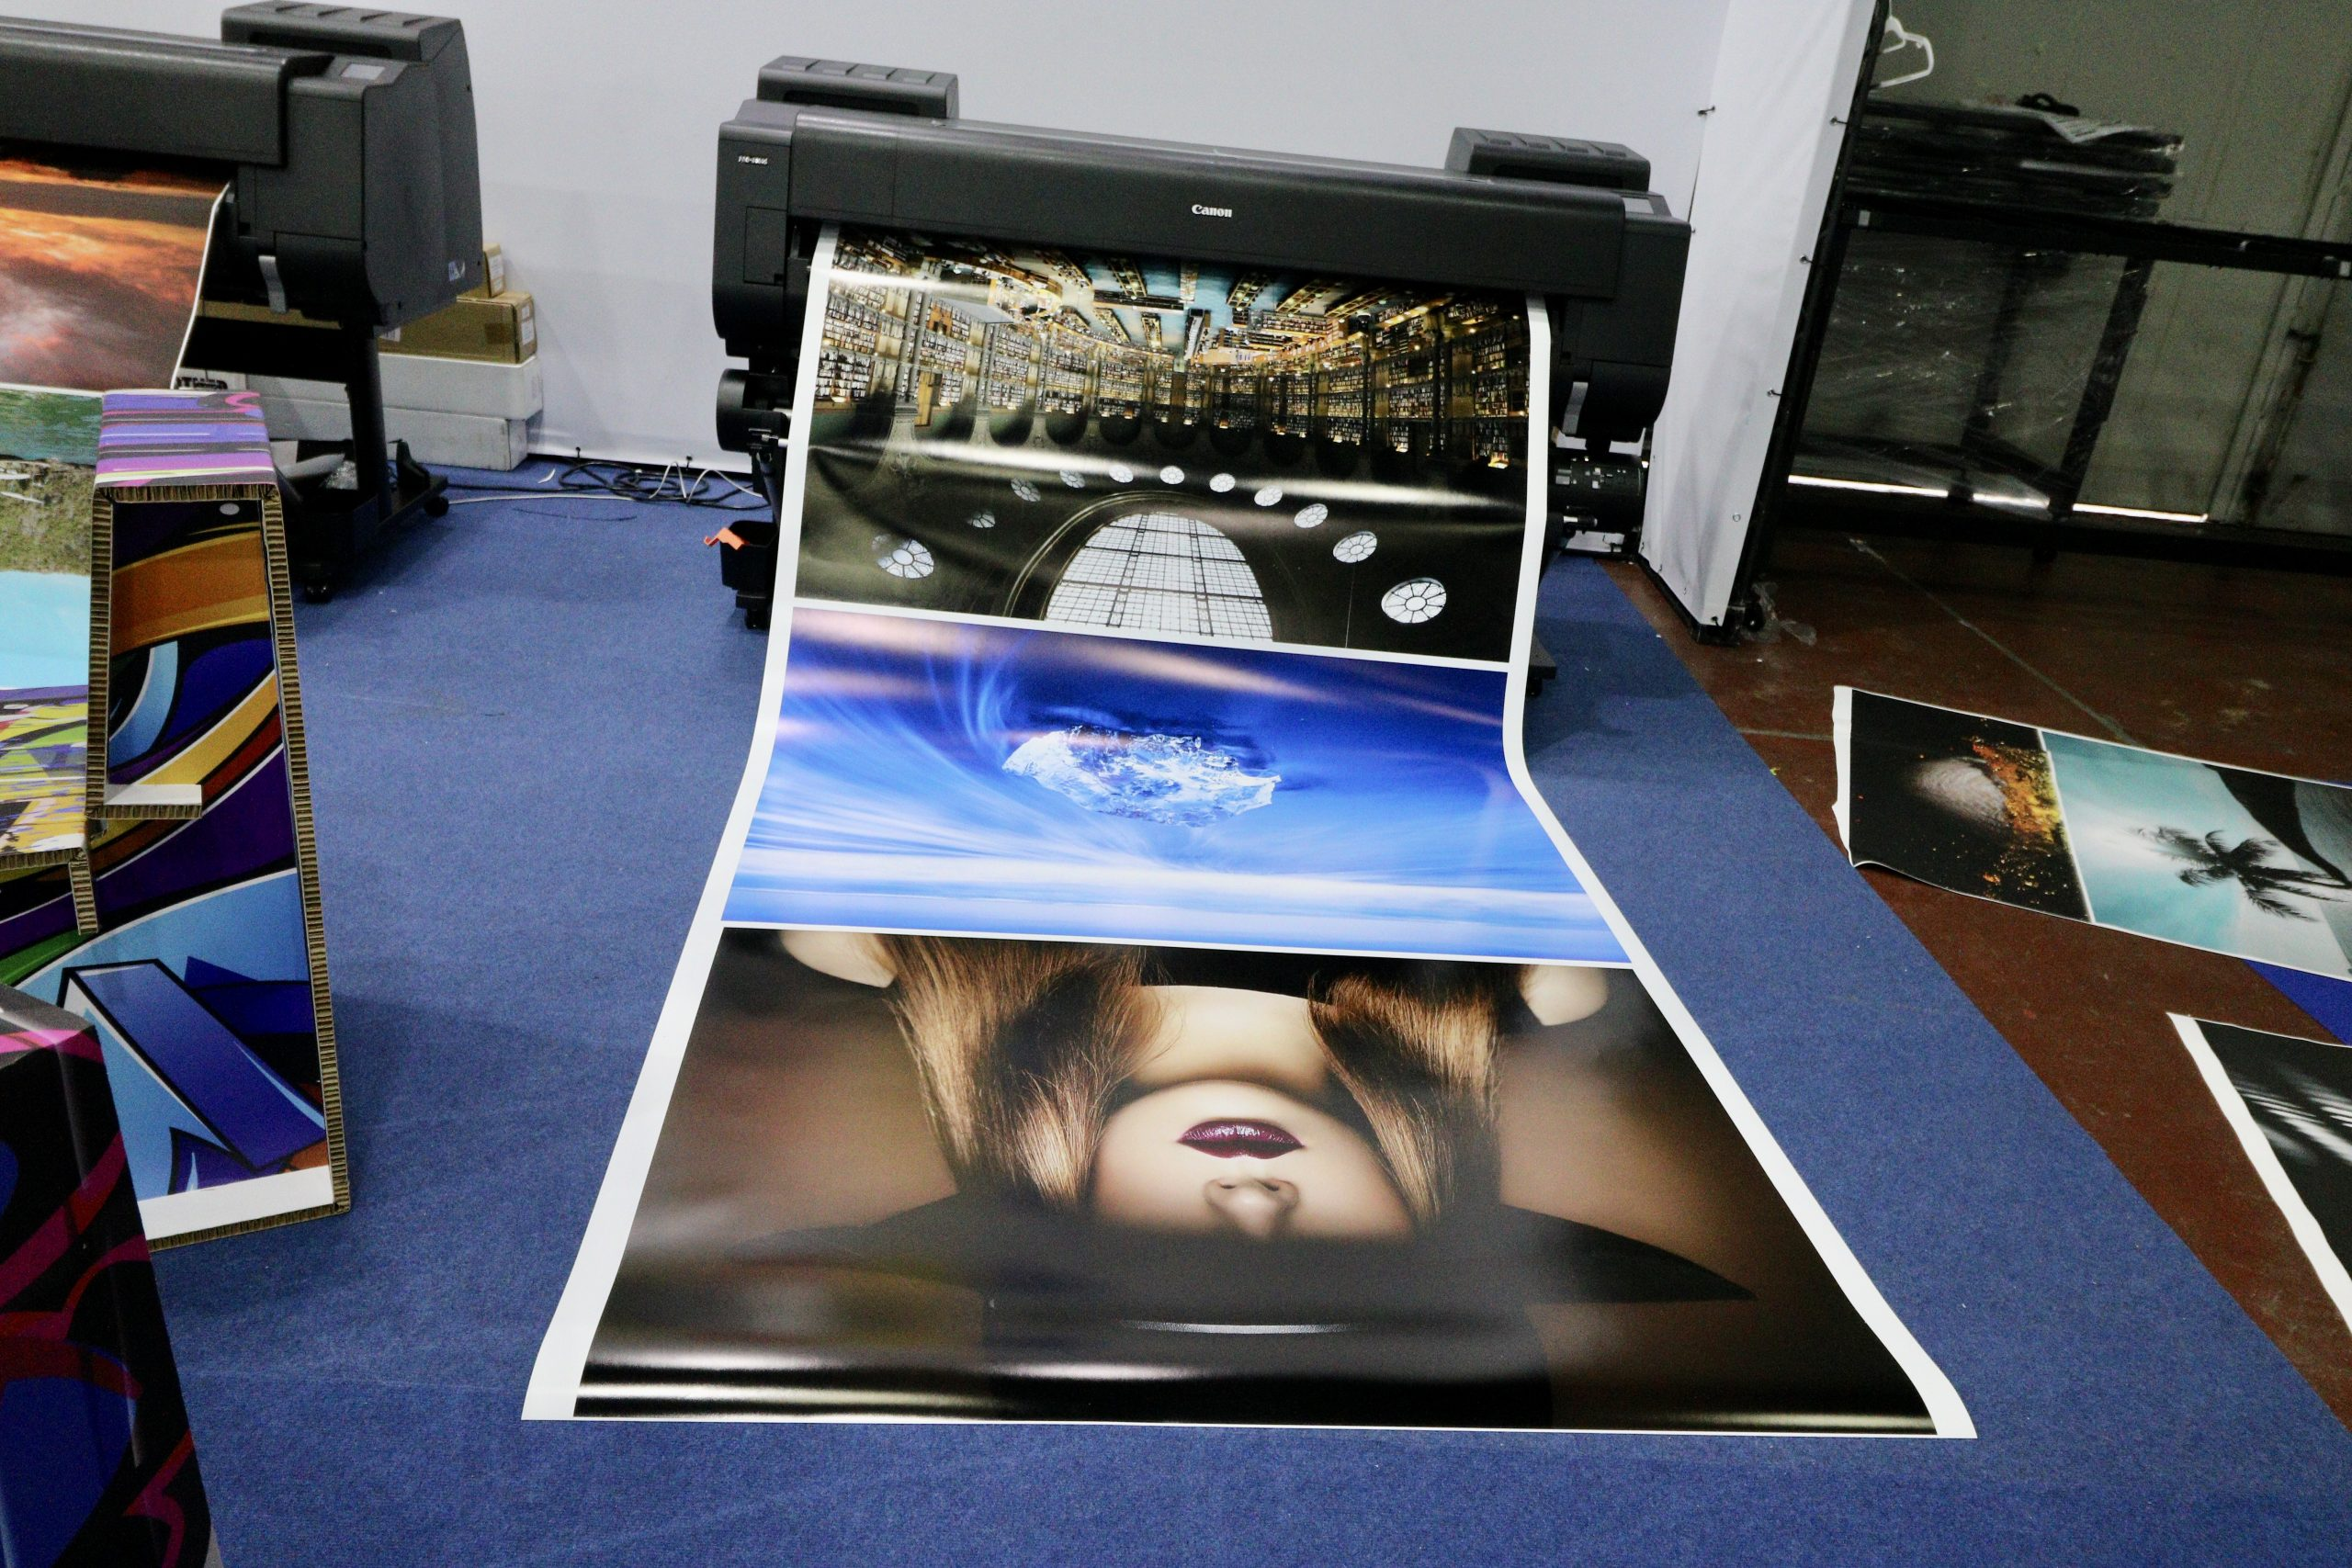 Prints.org: Disrupting traditional printing workflow